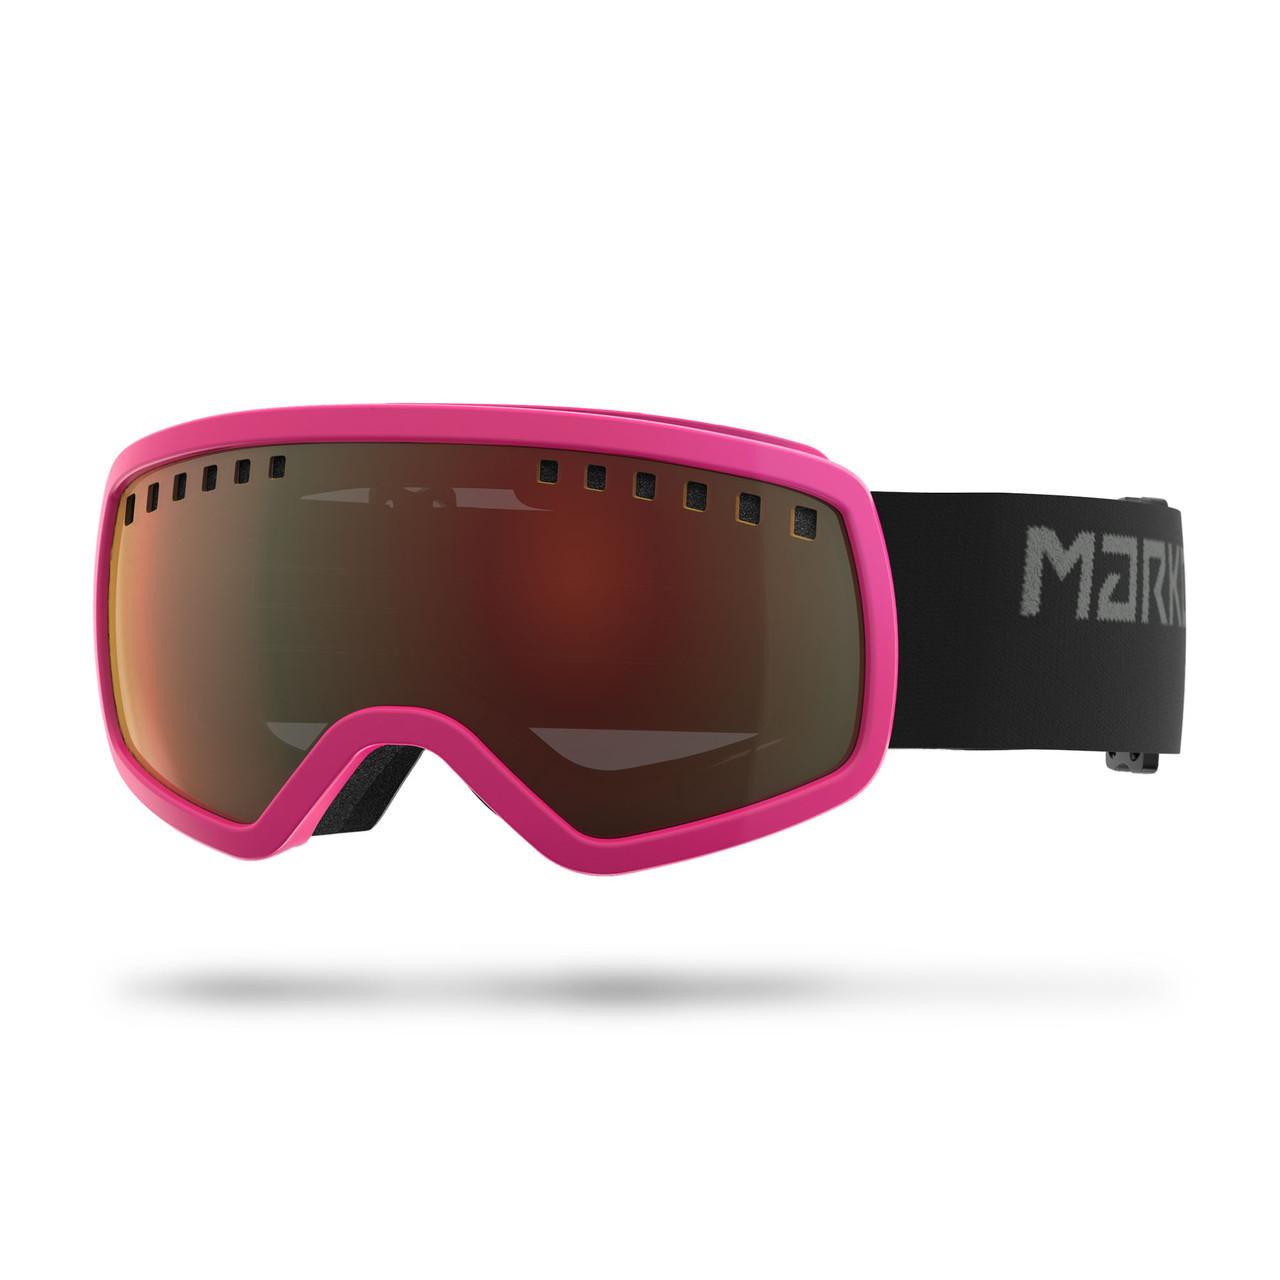 Маска Marker Surround Mirror Pink S СКИДКА - 40%